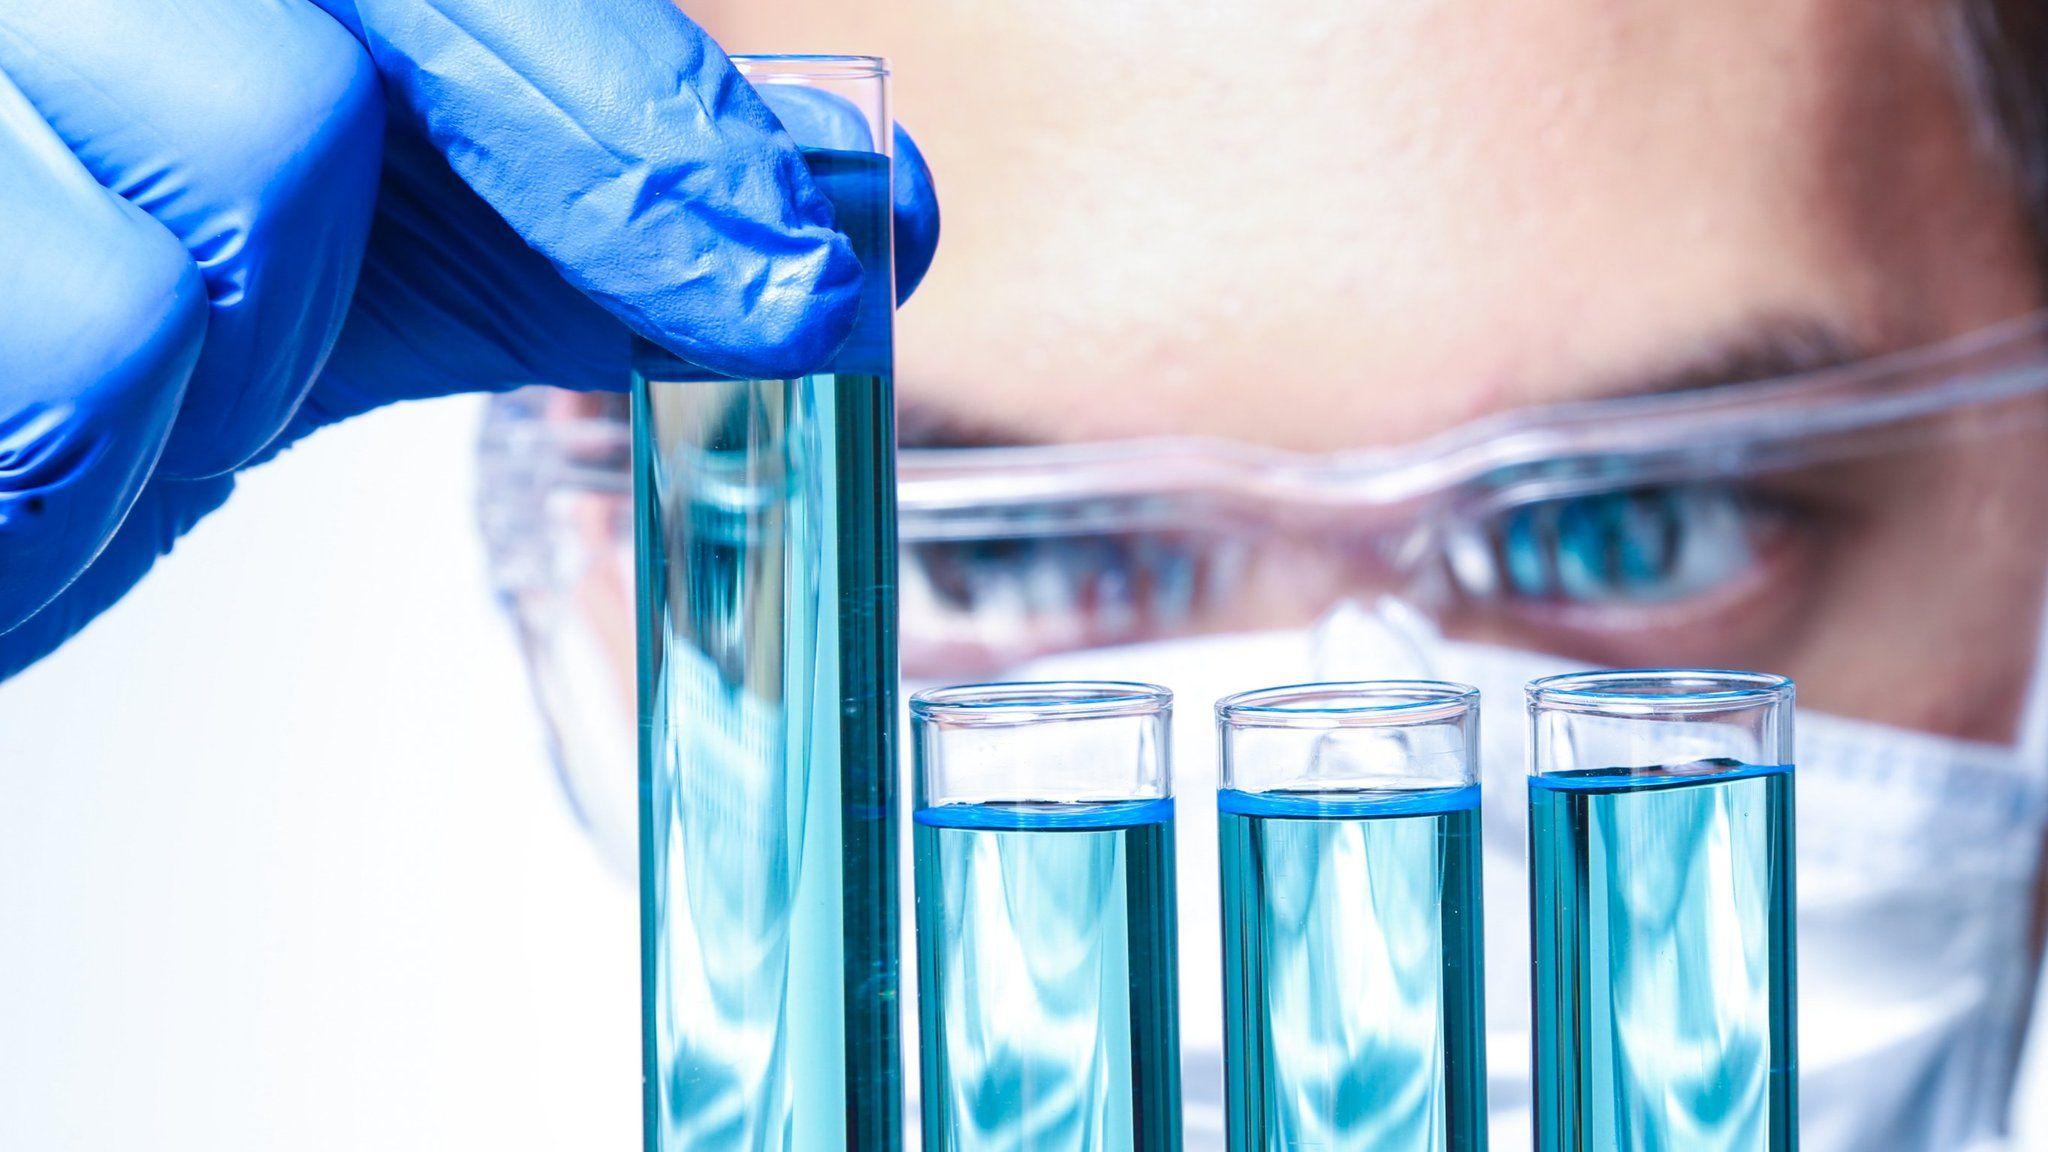 Big pharma seeks digital solution to productivity problem